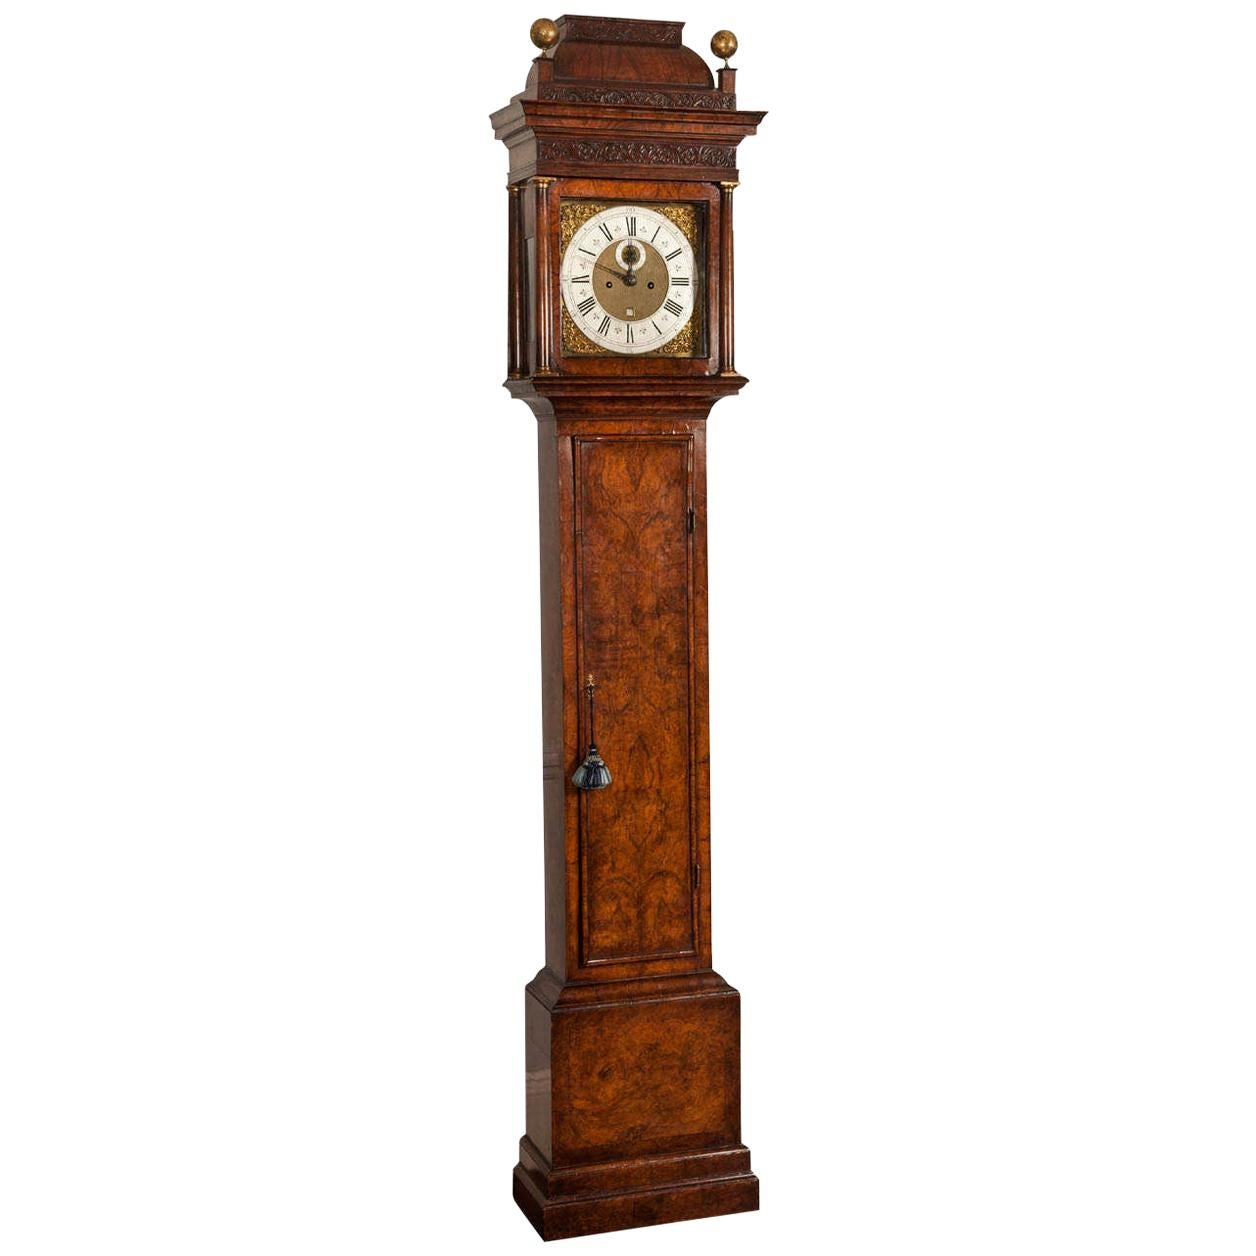 18th Century Antique Walnut Longcase Clock by Daniel Delander of London